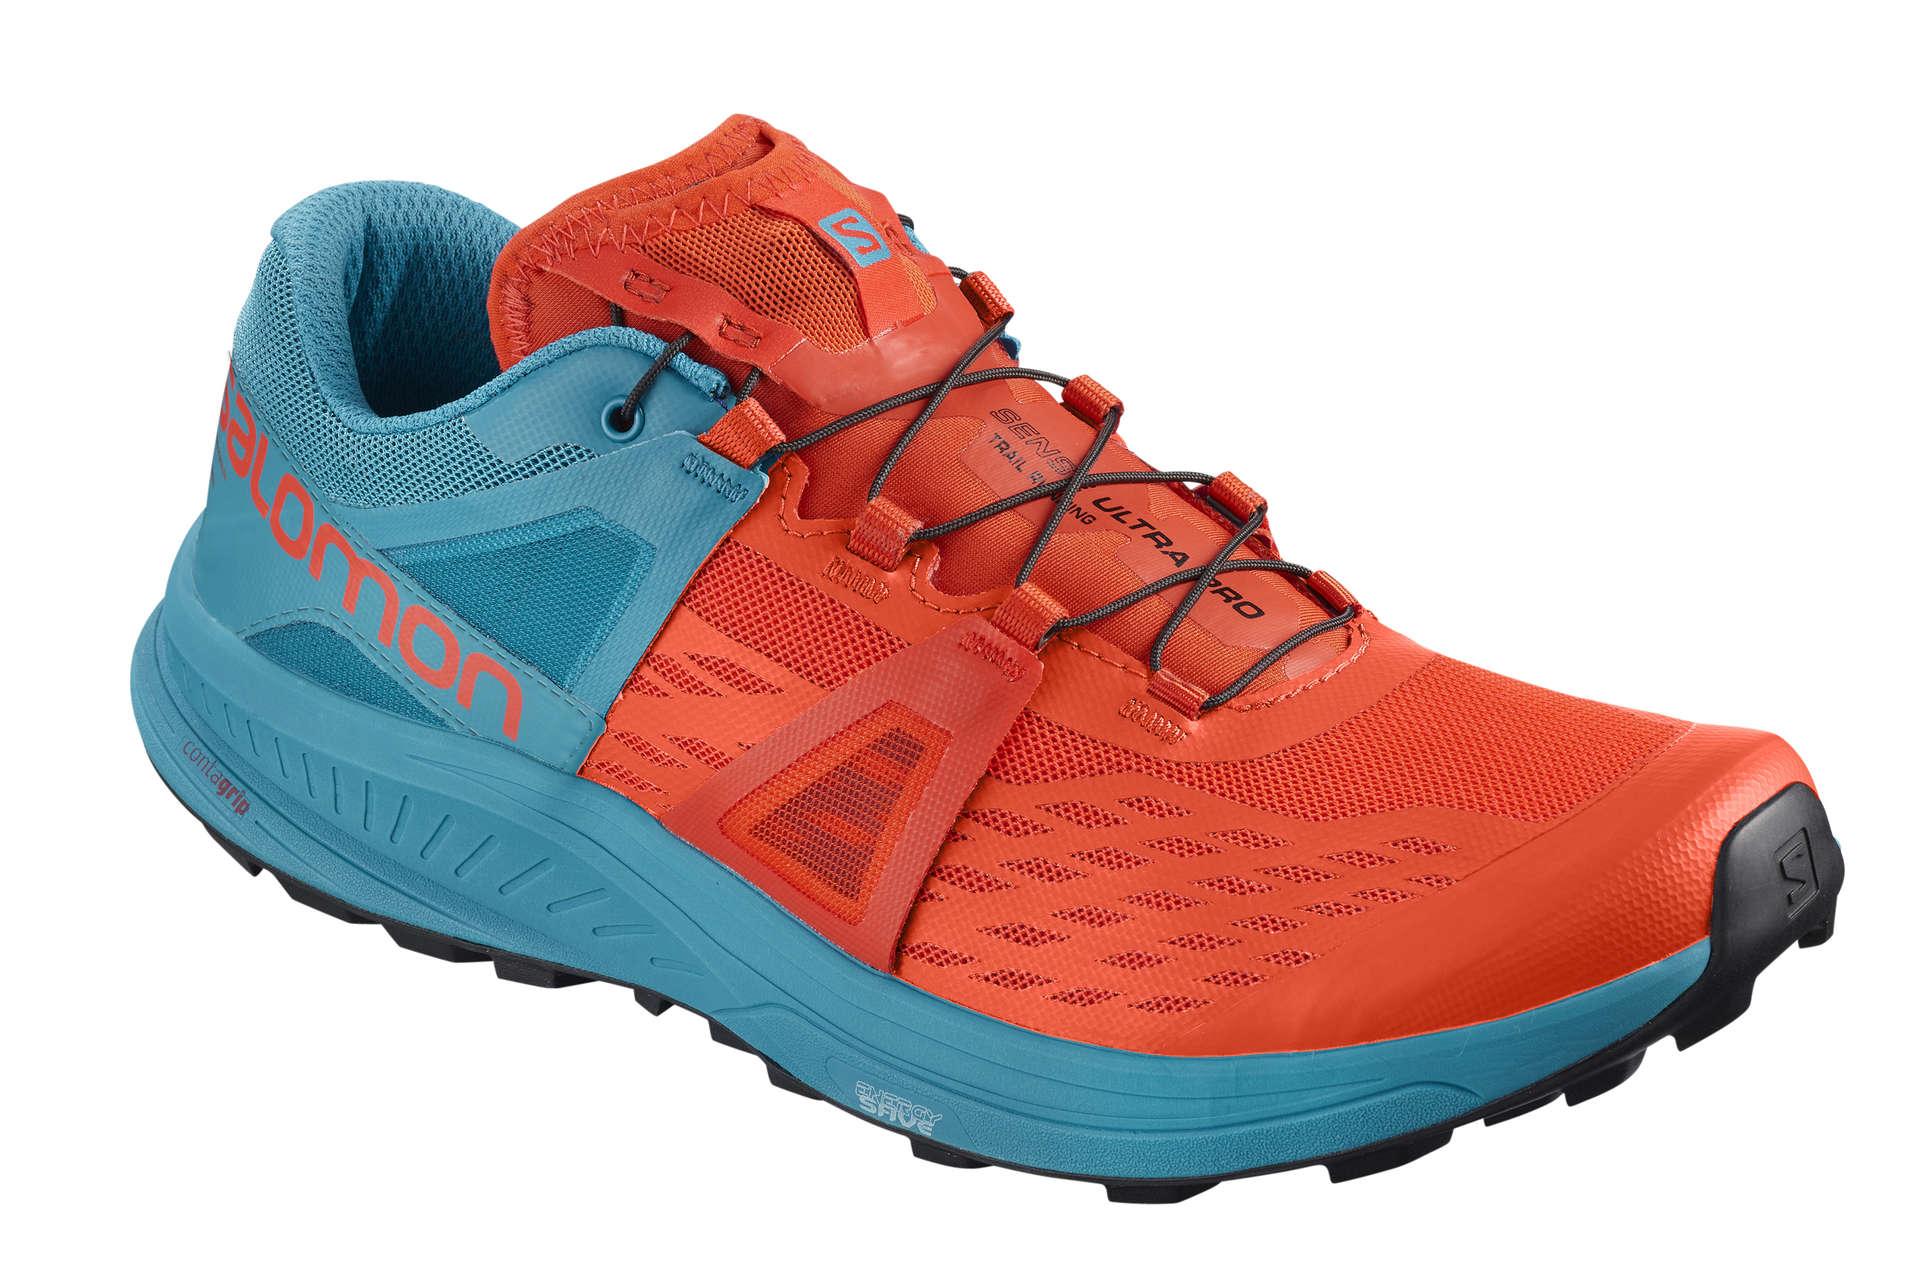 af7170529b7 Salomon Ultra Pro Trail Hardloopschoenen Oranje/Blauw Heren koop je ...